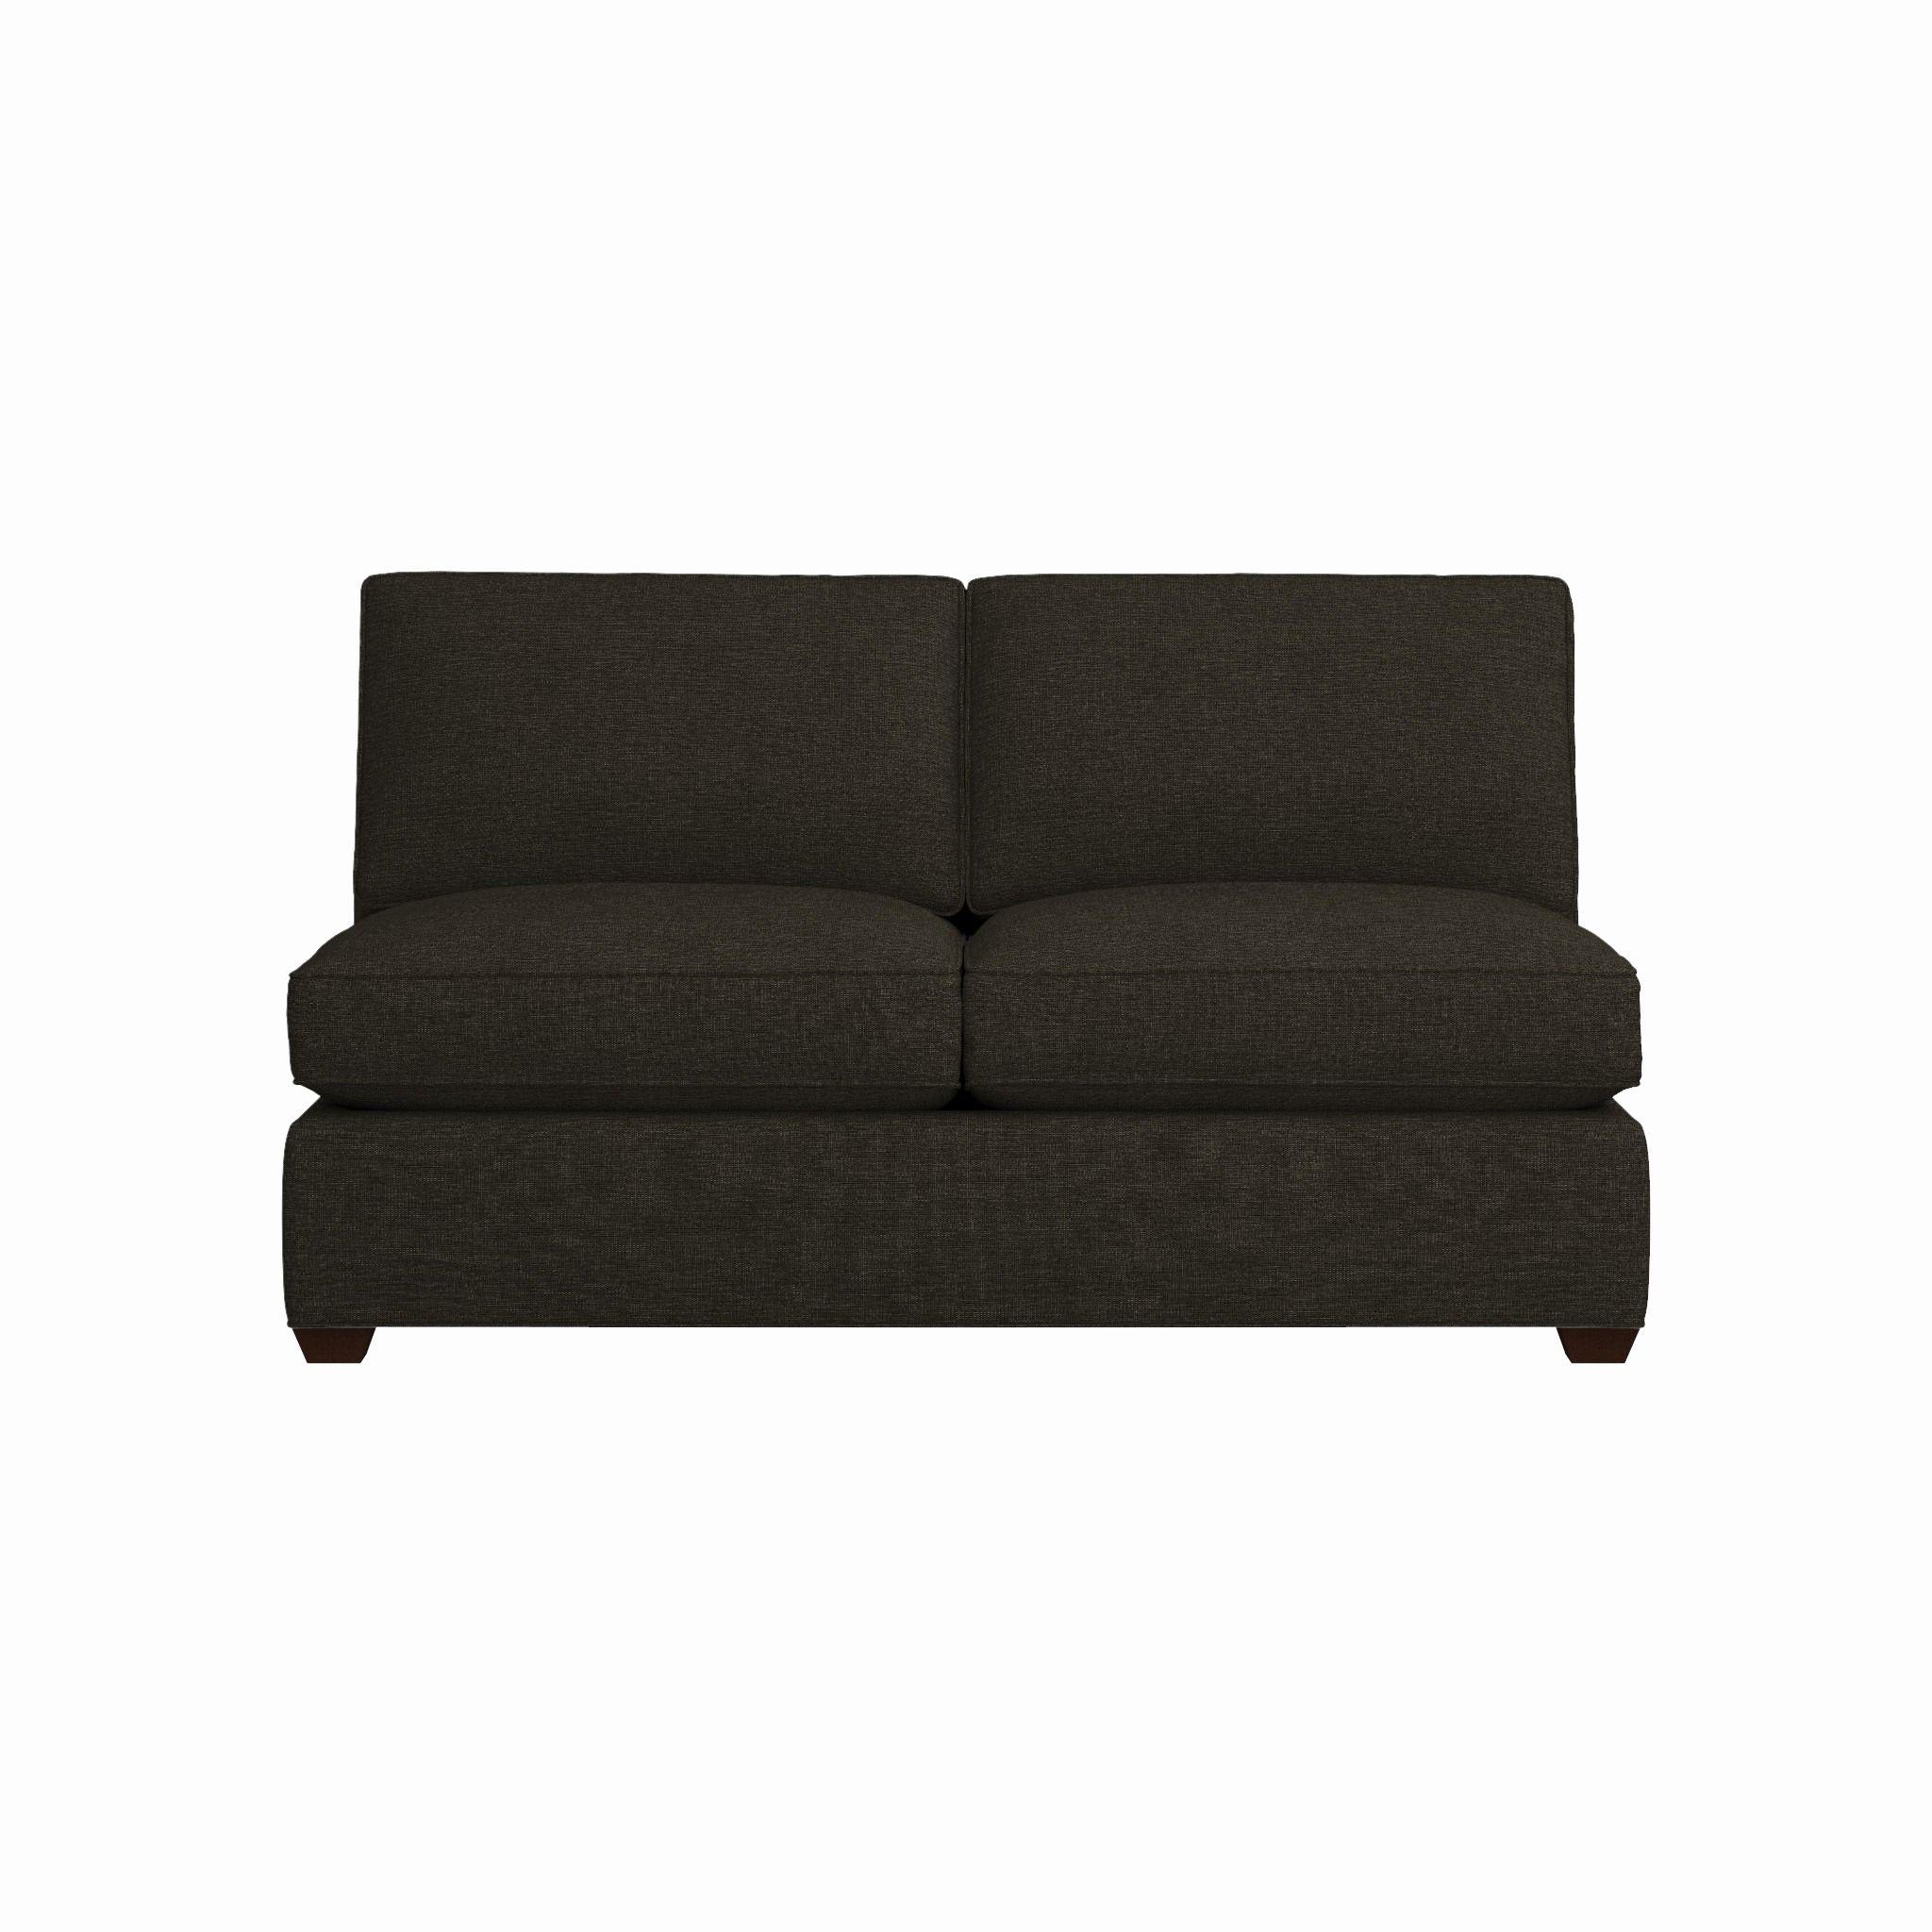 20 Schone Dhp Schlafsofa Sofa Sofa Kaufen Gunstige Sofas